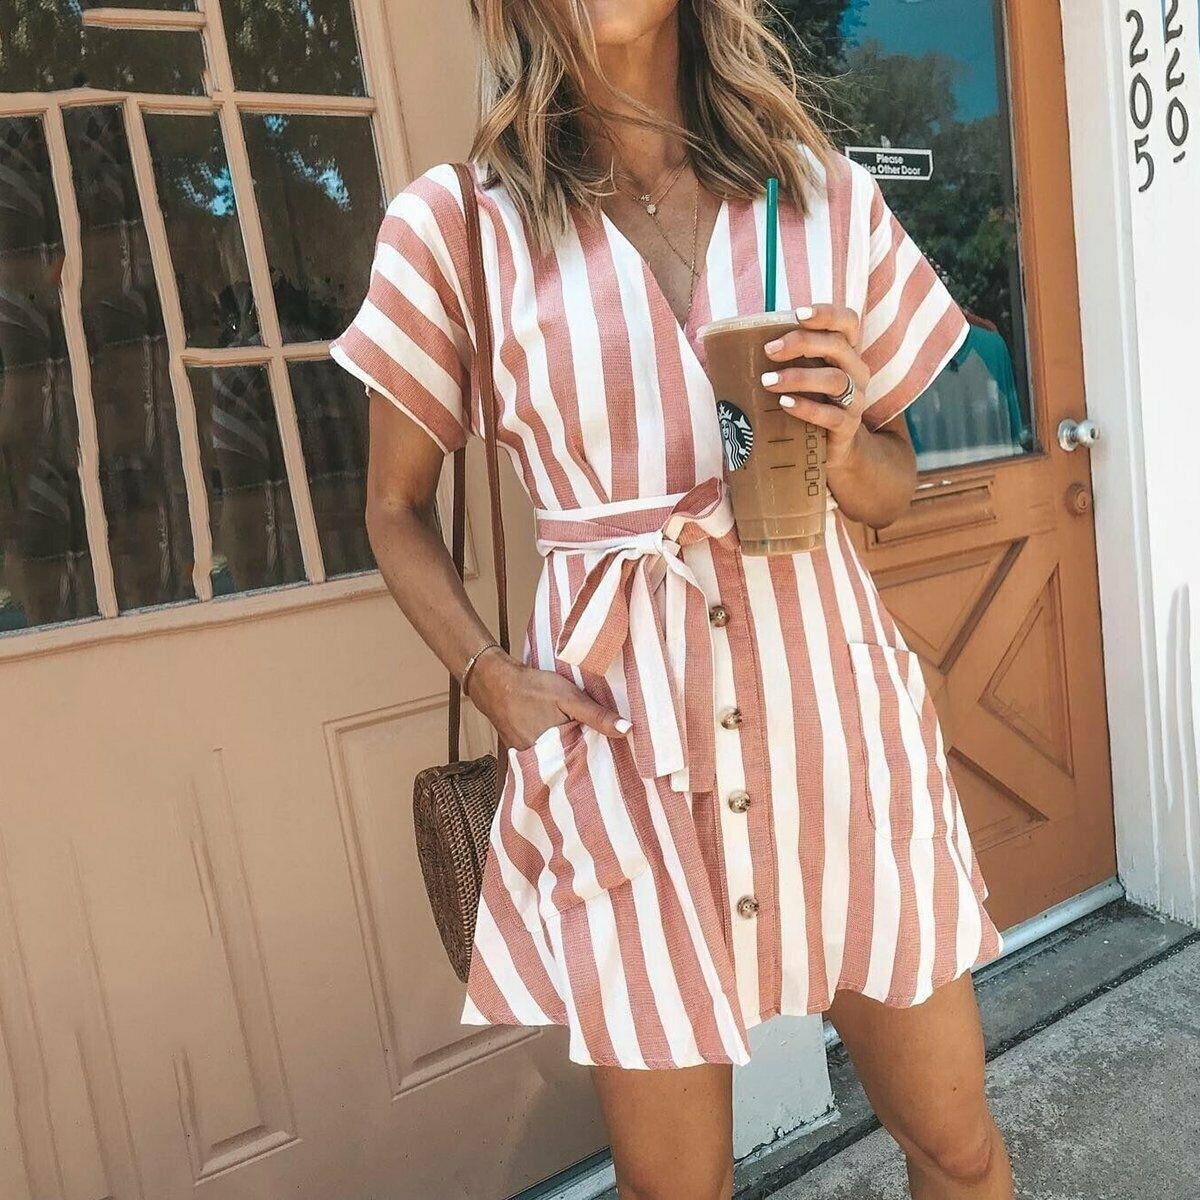 Women Summer Striped V Neck Dress Casual Button Short Sleeve Loose Dress Fashion Women Clothes Mini Sundress